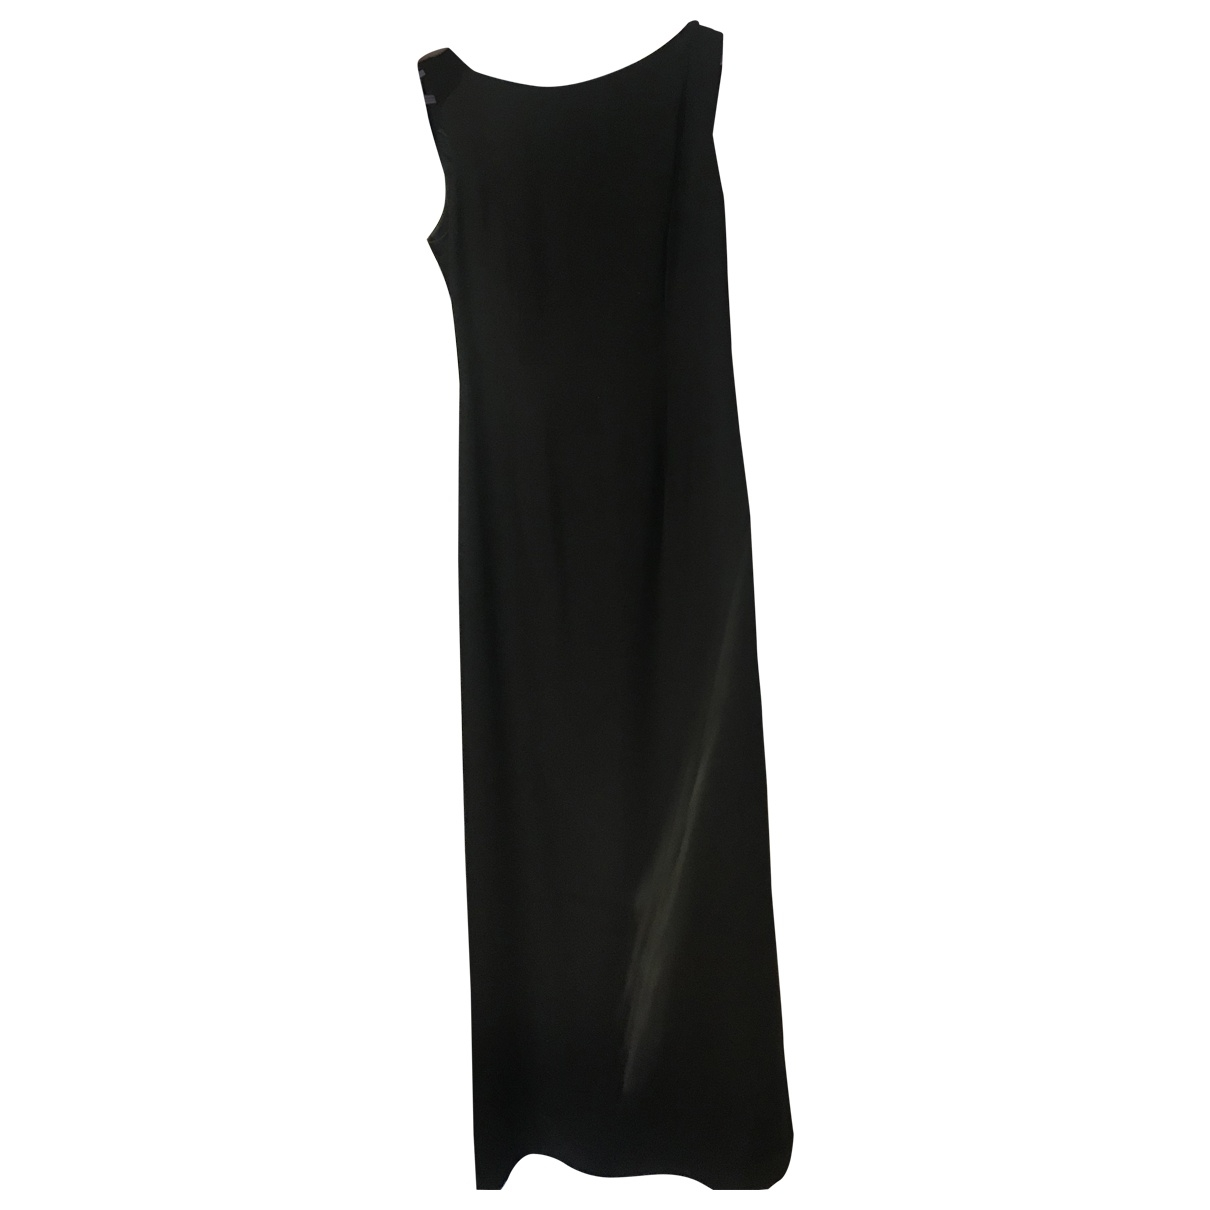 Carolina Herrera \N Black Silk dress for Women 36 FR